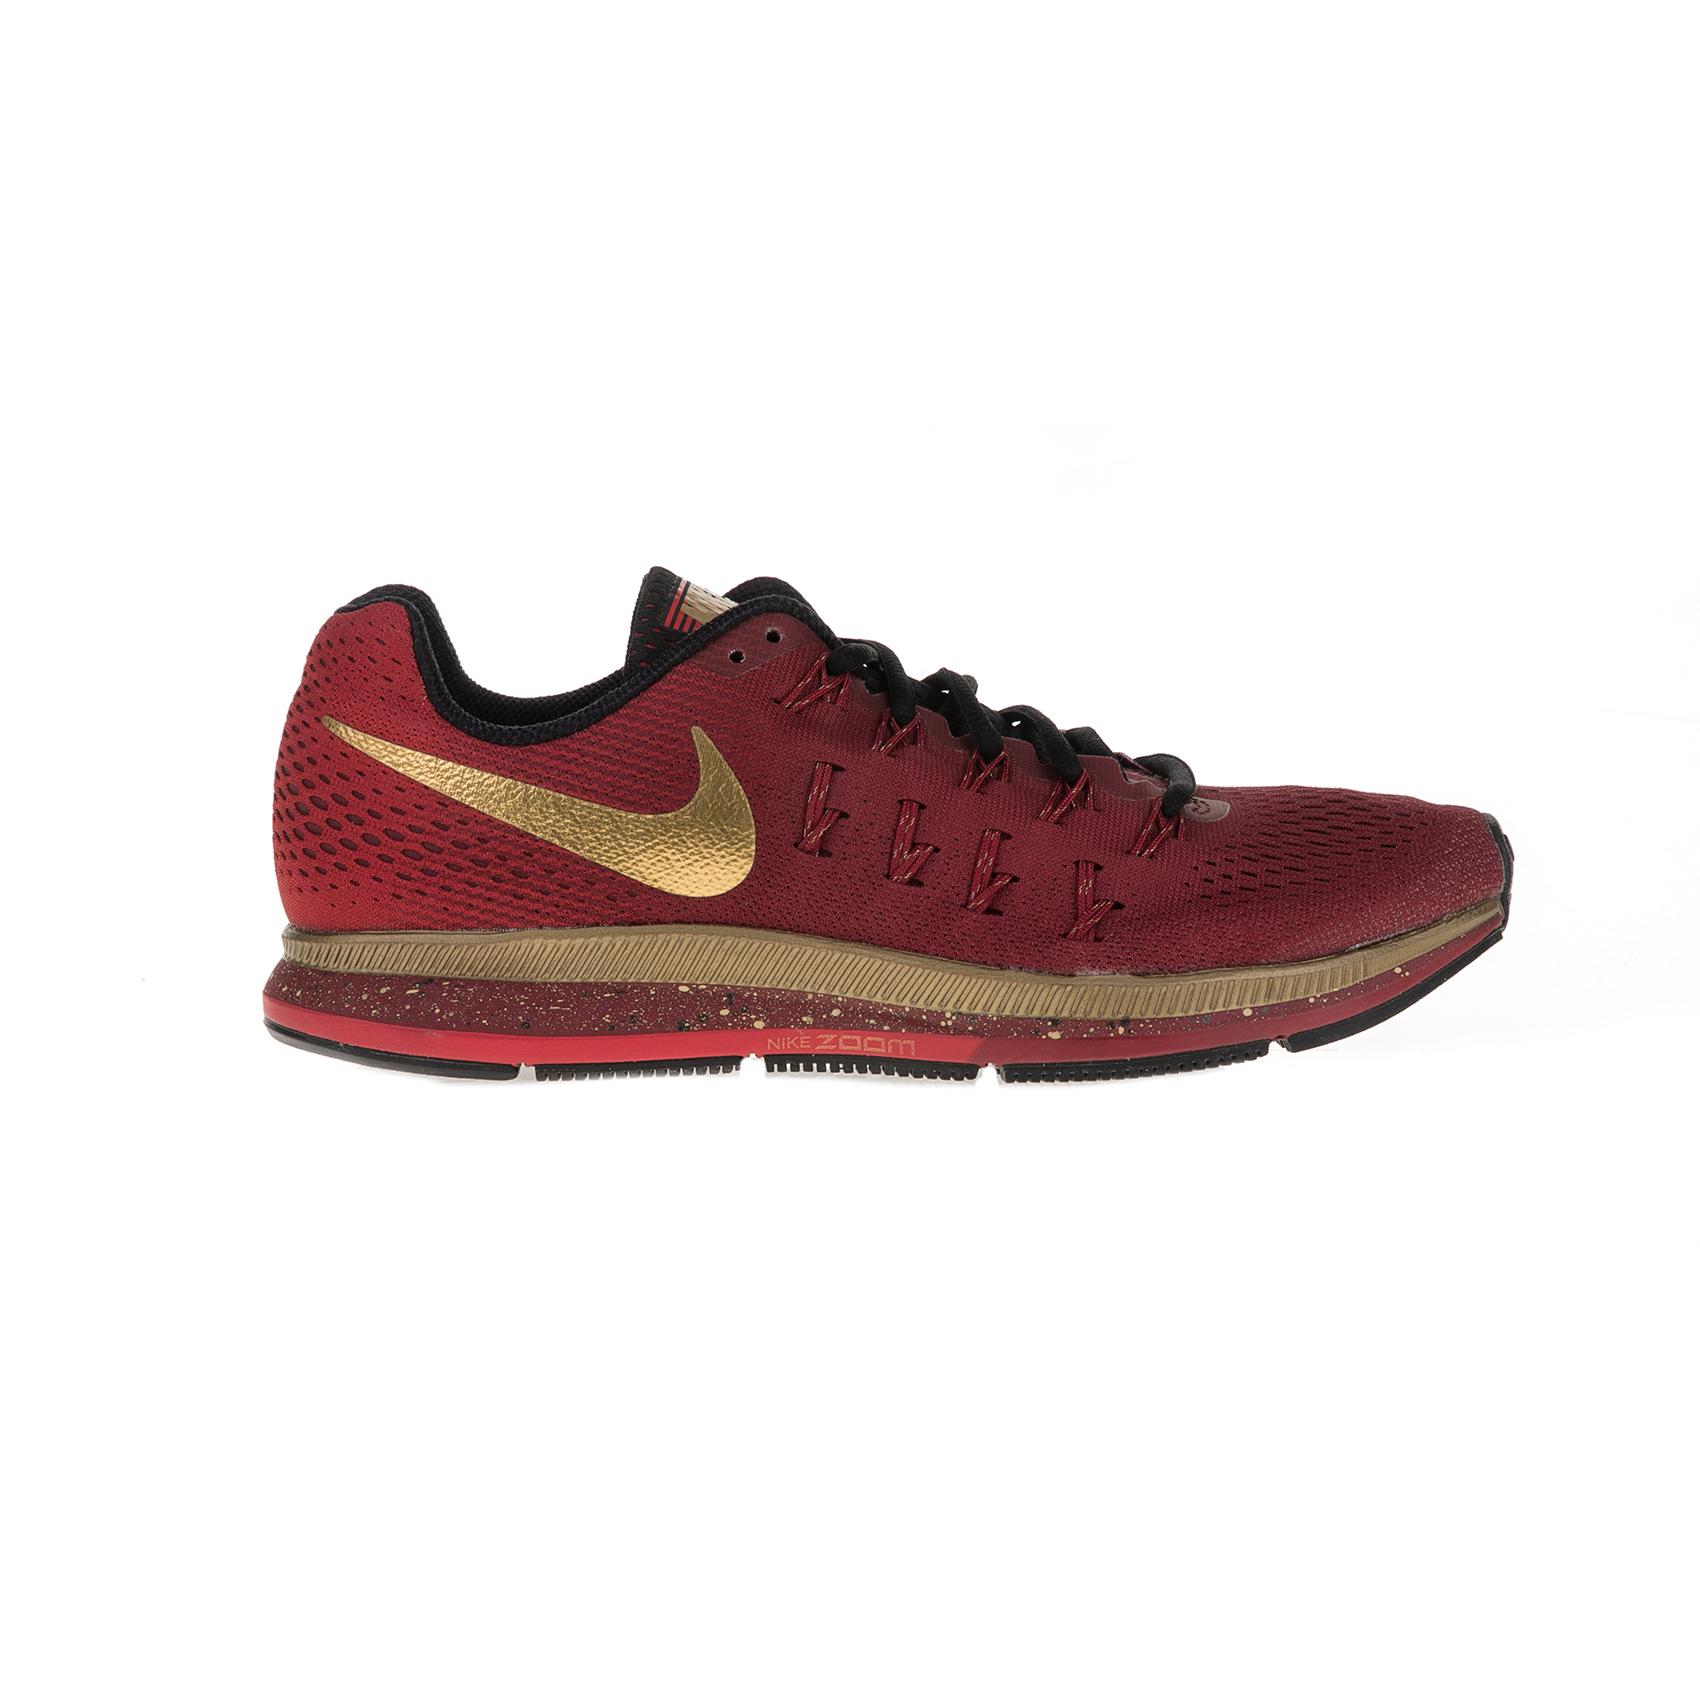 NIKE – Ανδρικά παπούτσια AIR ZOOM PEGASUS 33 μπλε-κόκκινα